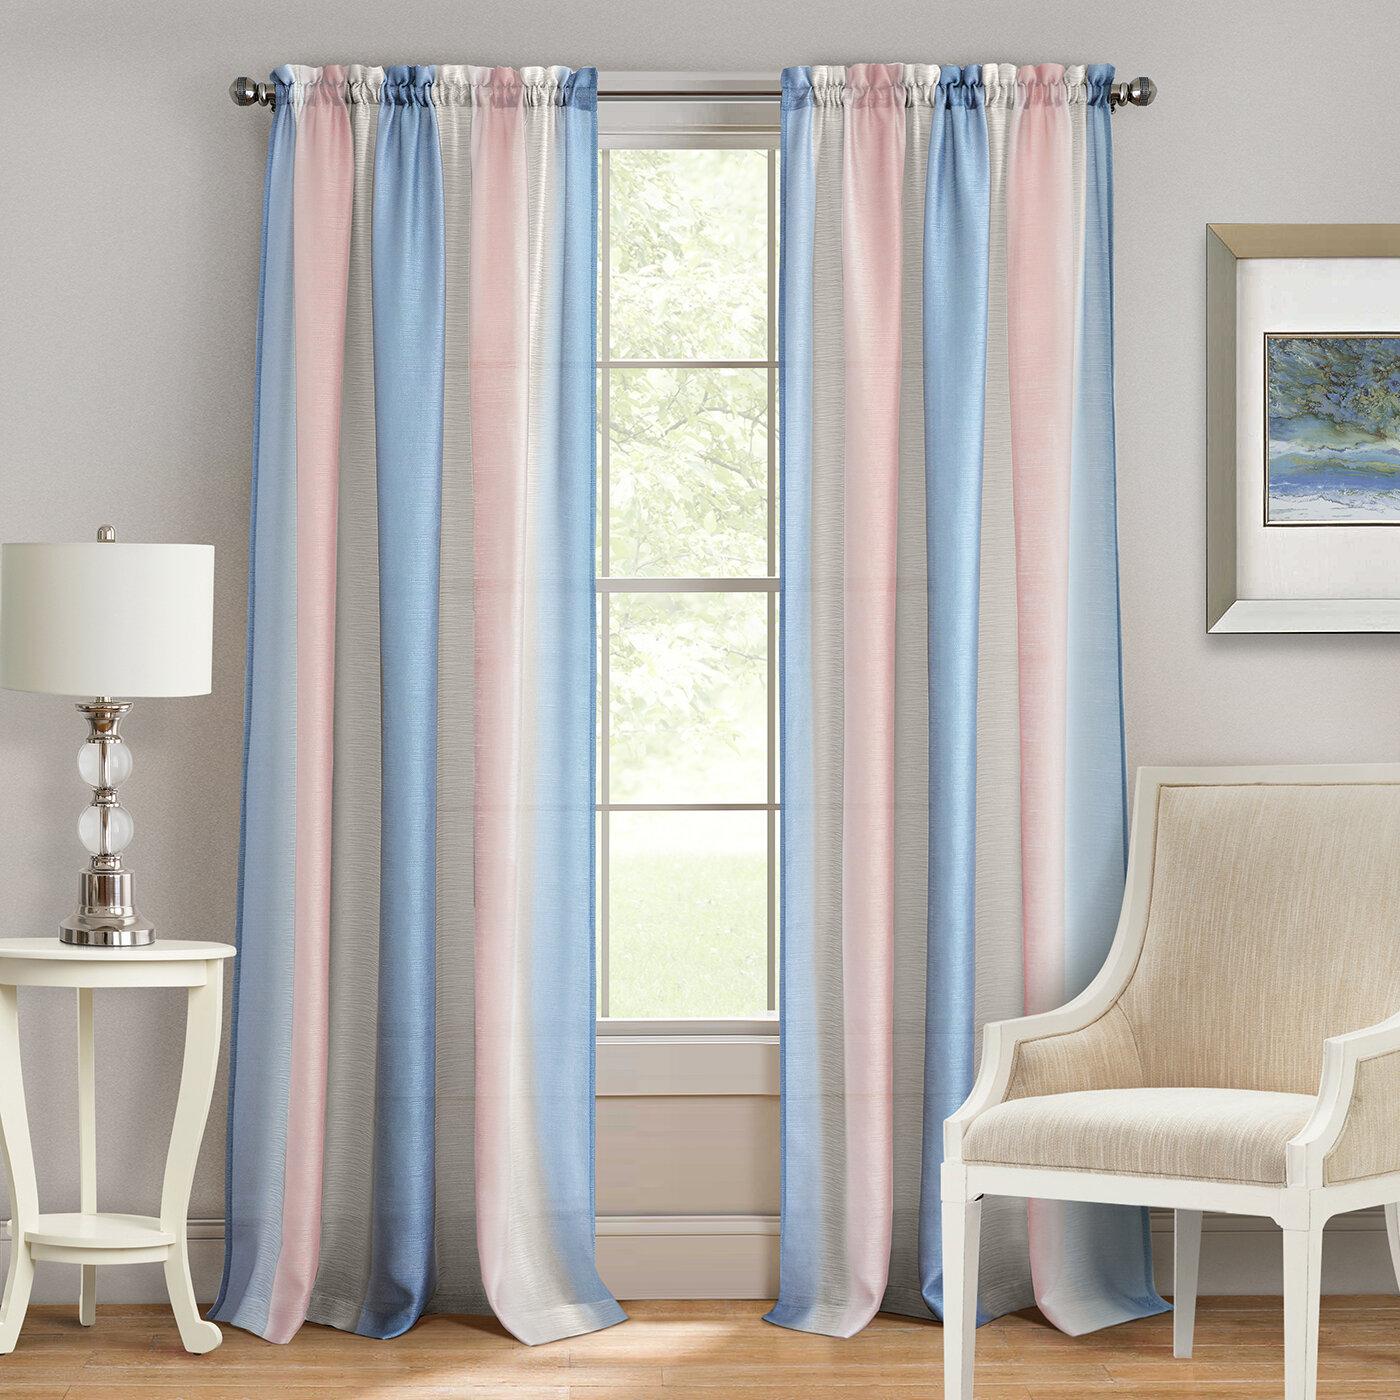 Shields Elegant Striped Semi Sheer Rod Pocket Curtain Panels